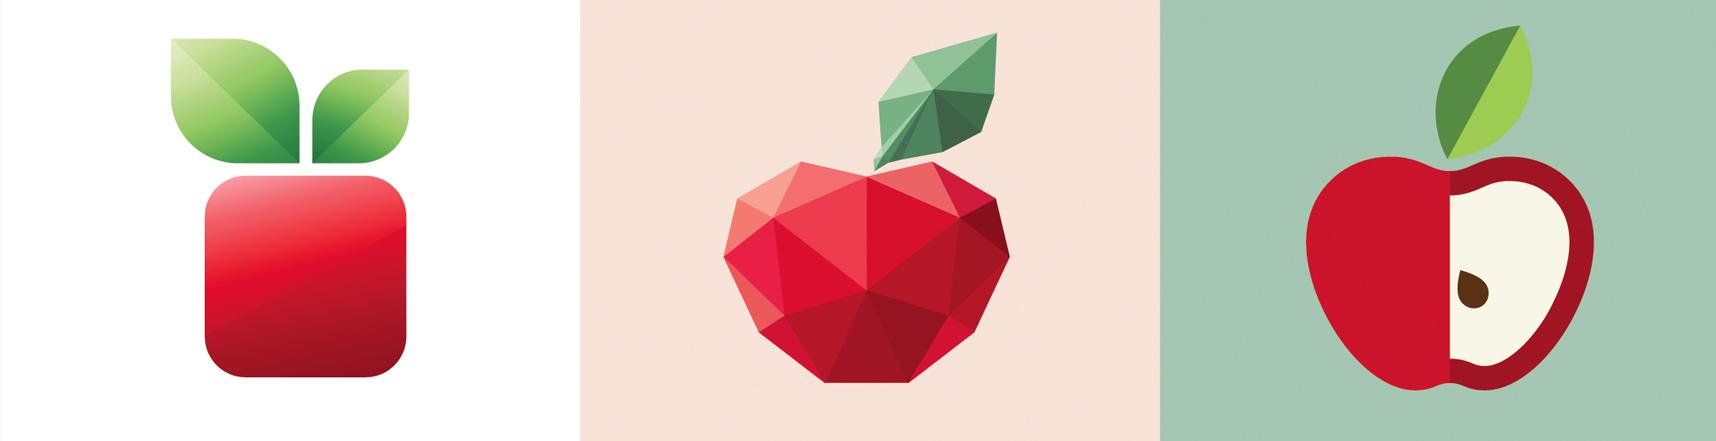 Apple_Resources1.jpg